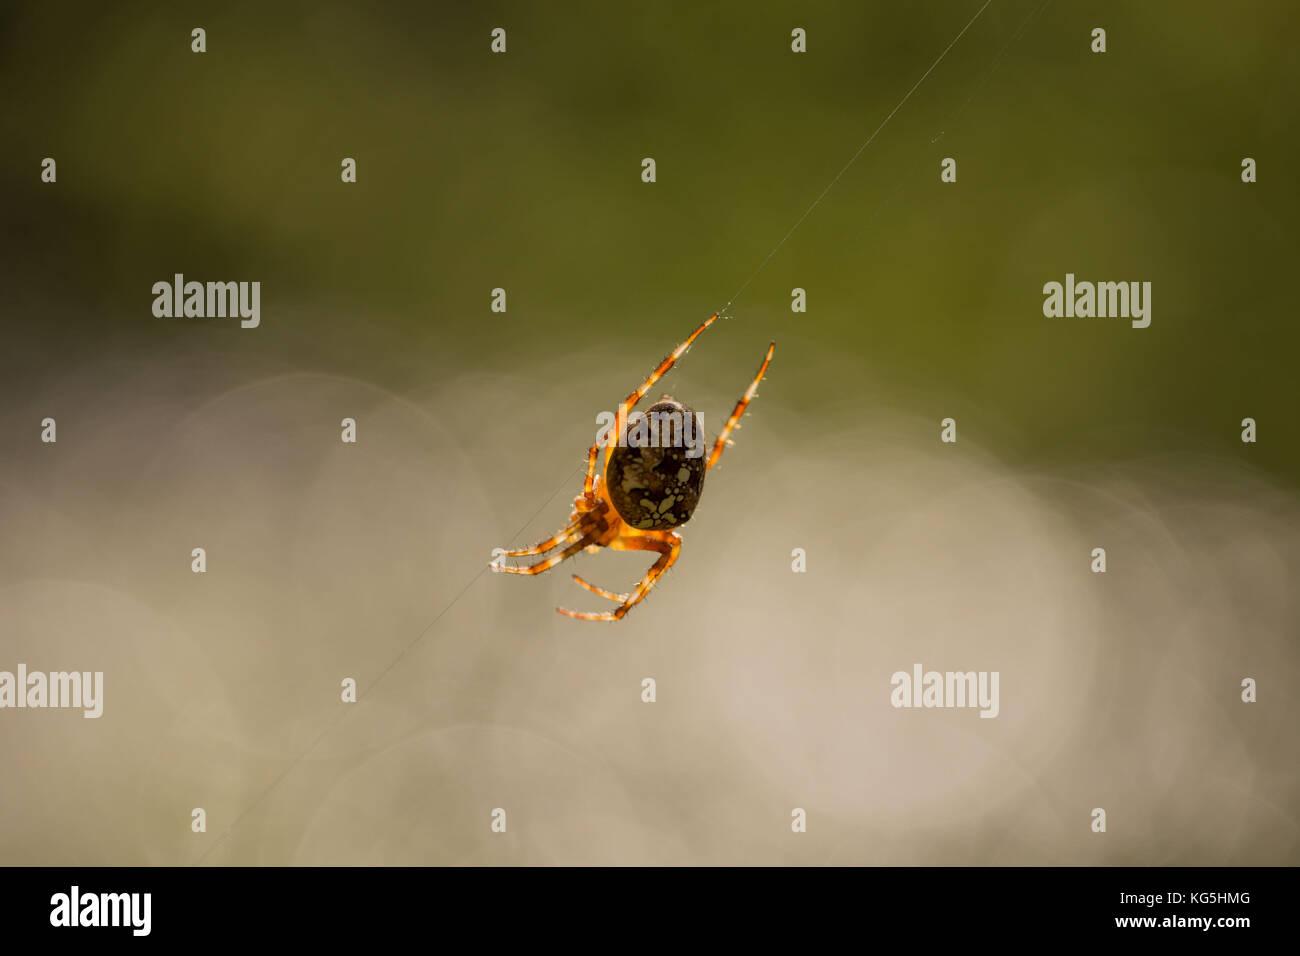 Araneus diadematus, Cross Orbweaver - Stock Image